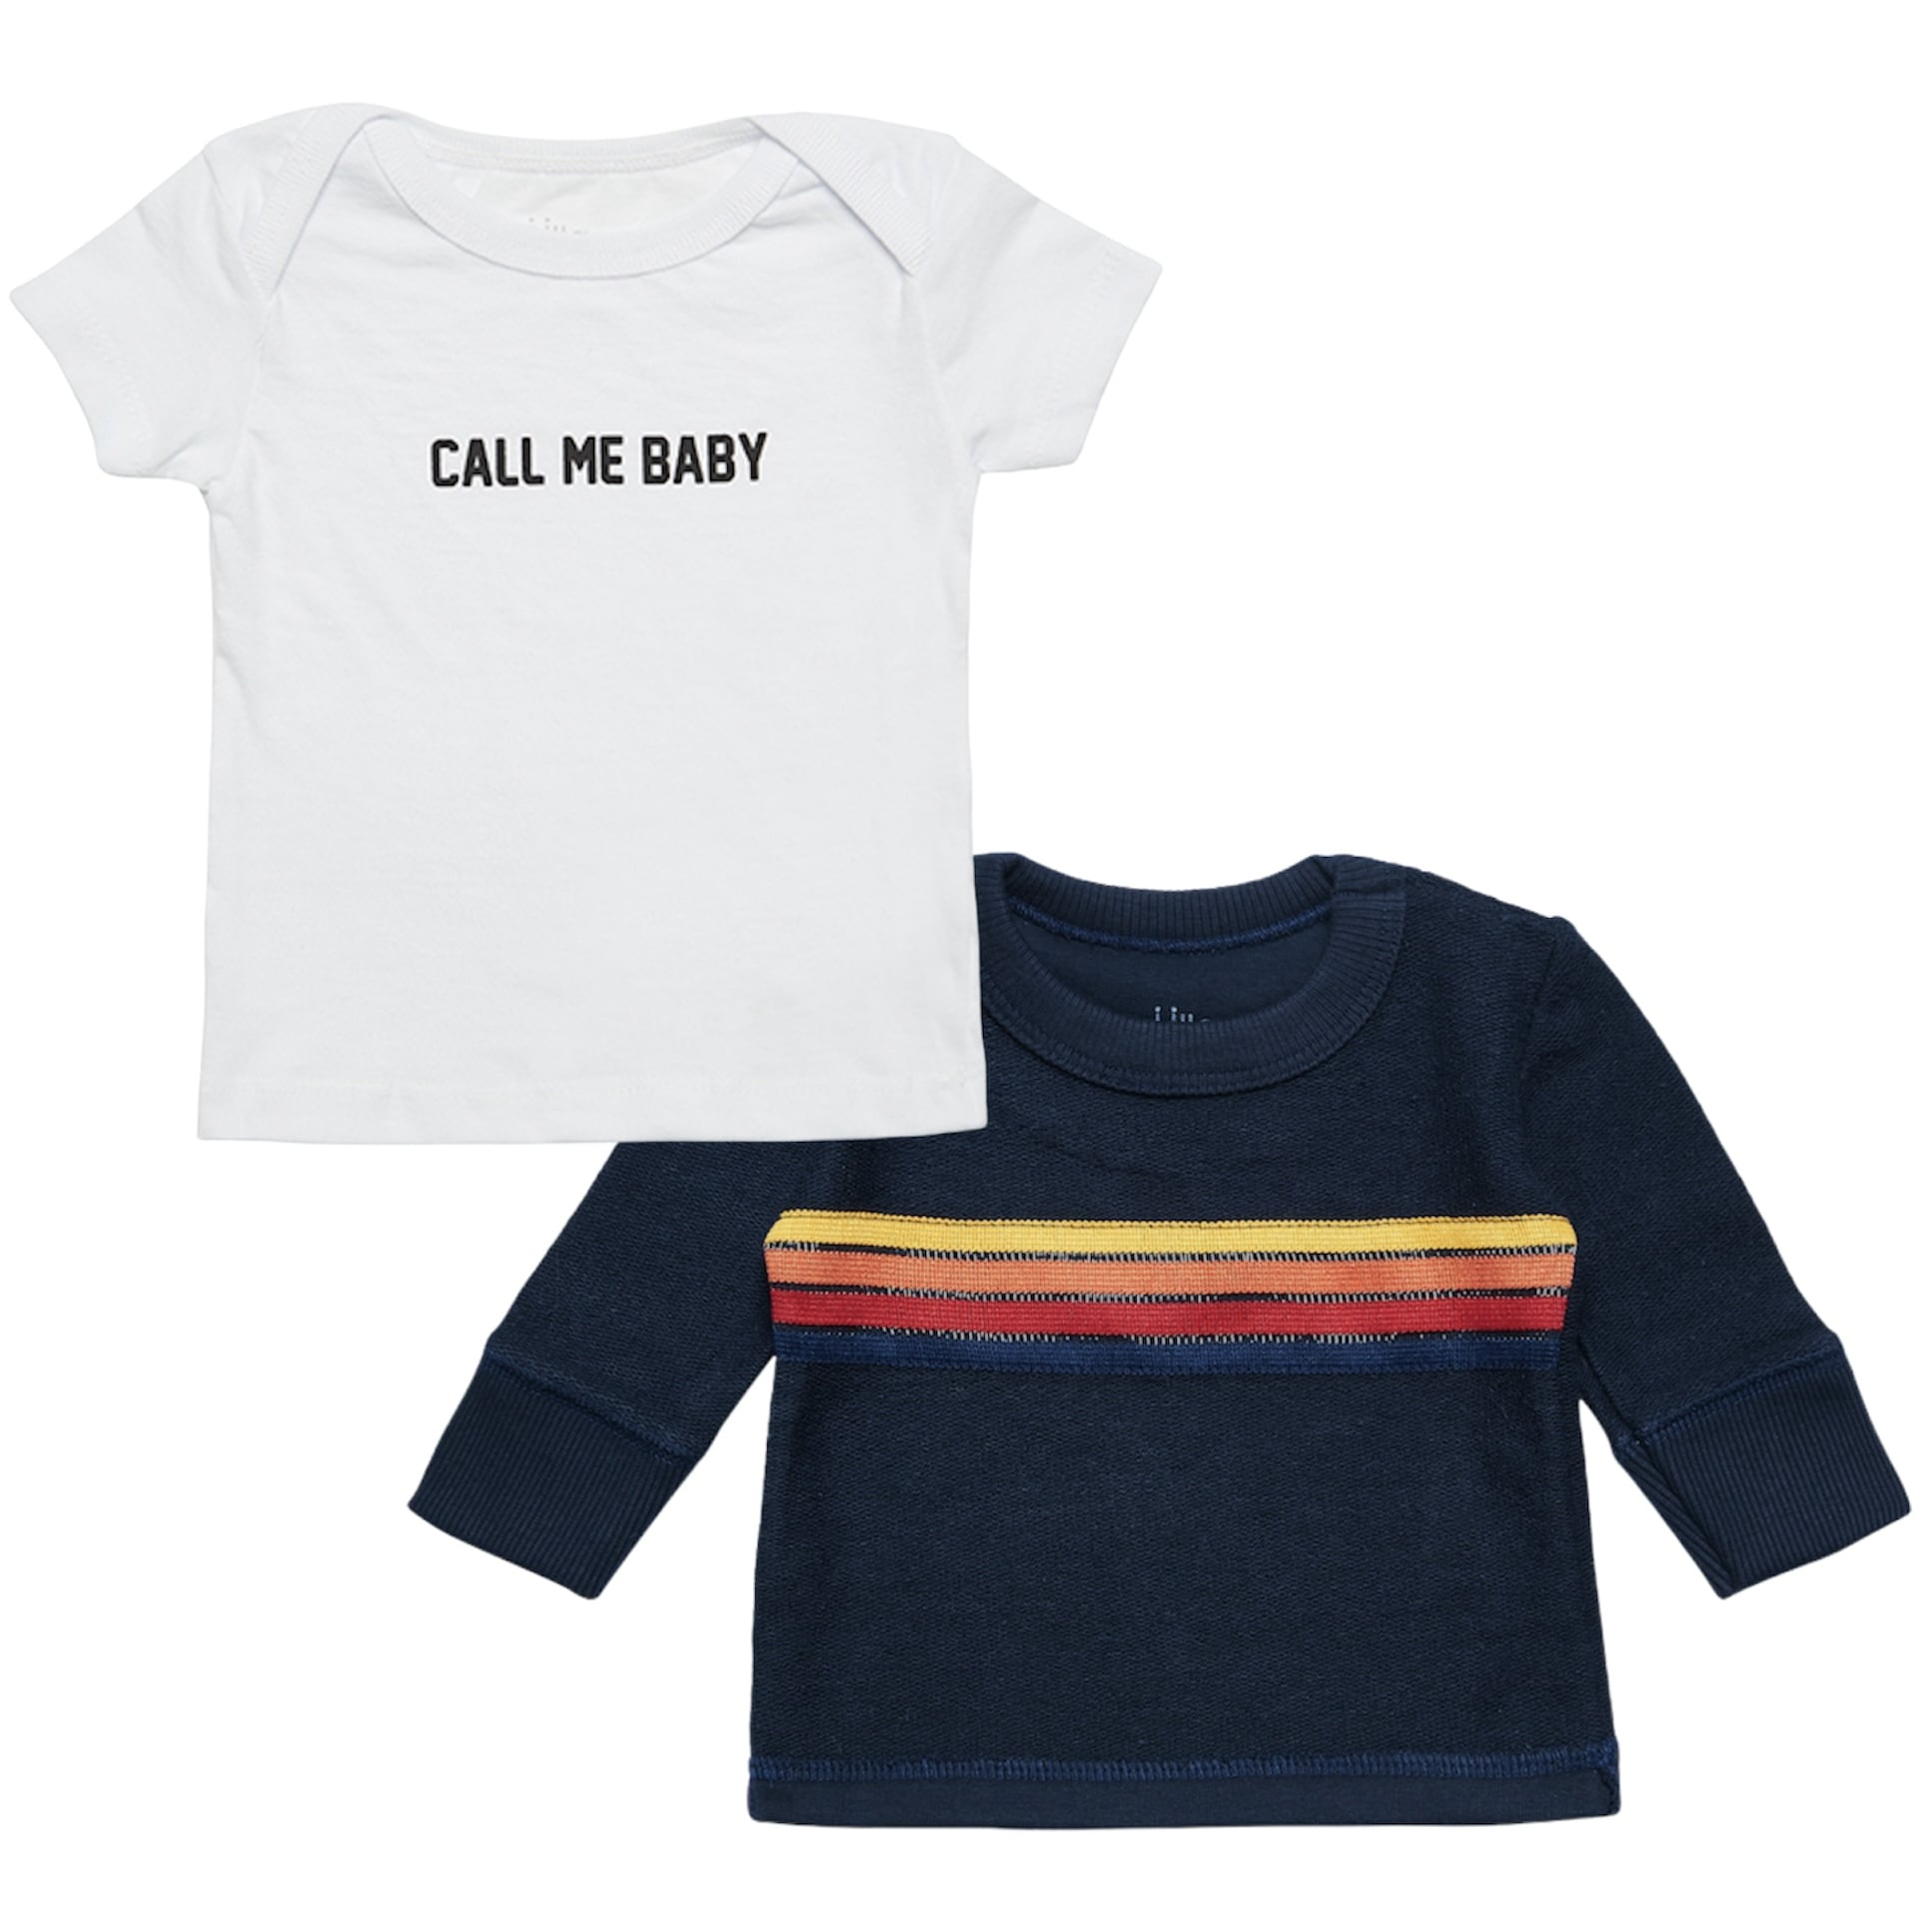 KIT MOLETOM NASCAR + CAMISETA CALL ME BABY